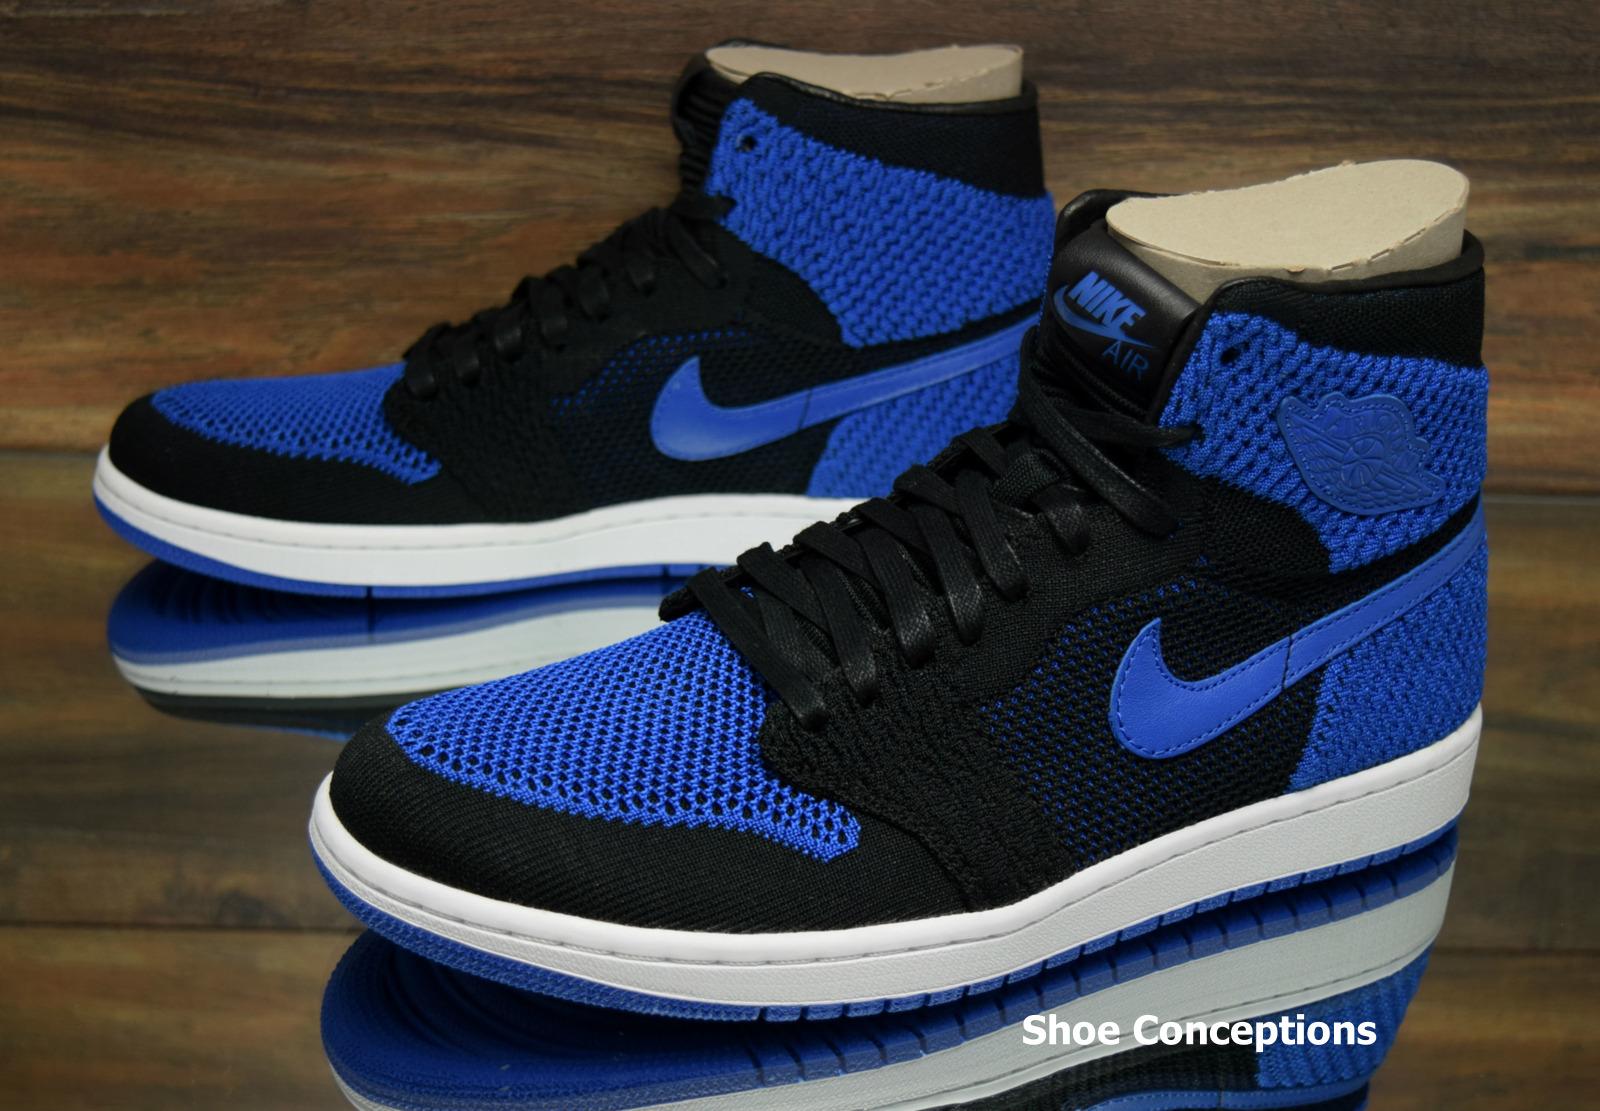 Air Jordan 1 Retro Hi Flyknit Black Blue Men's Shoes - Size 10, 11.5